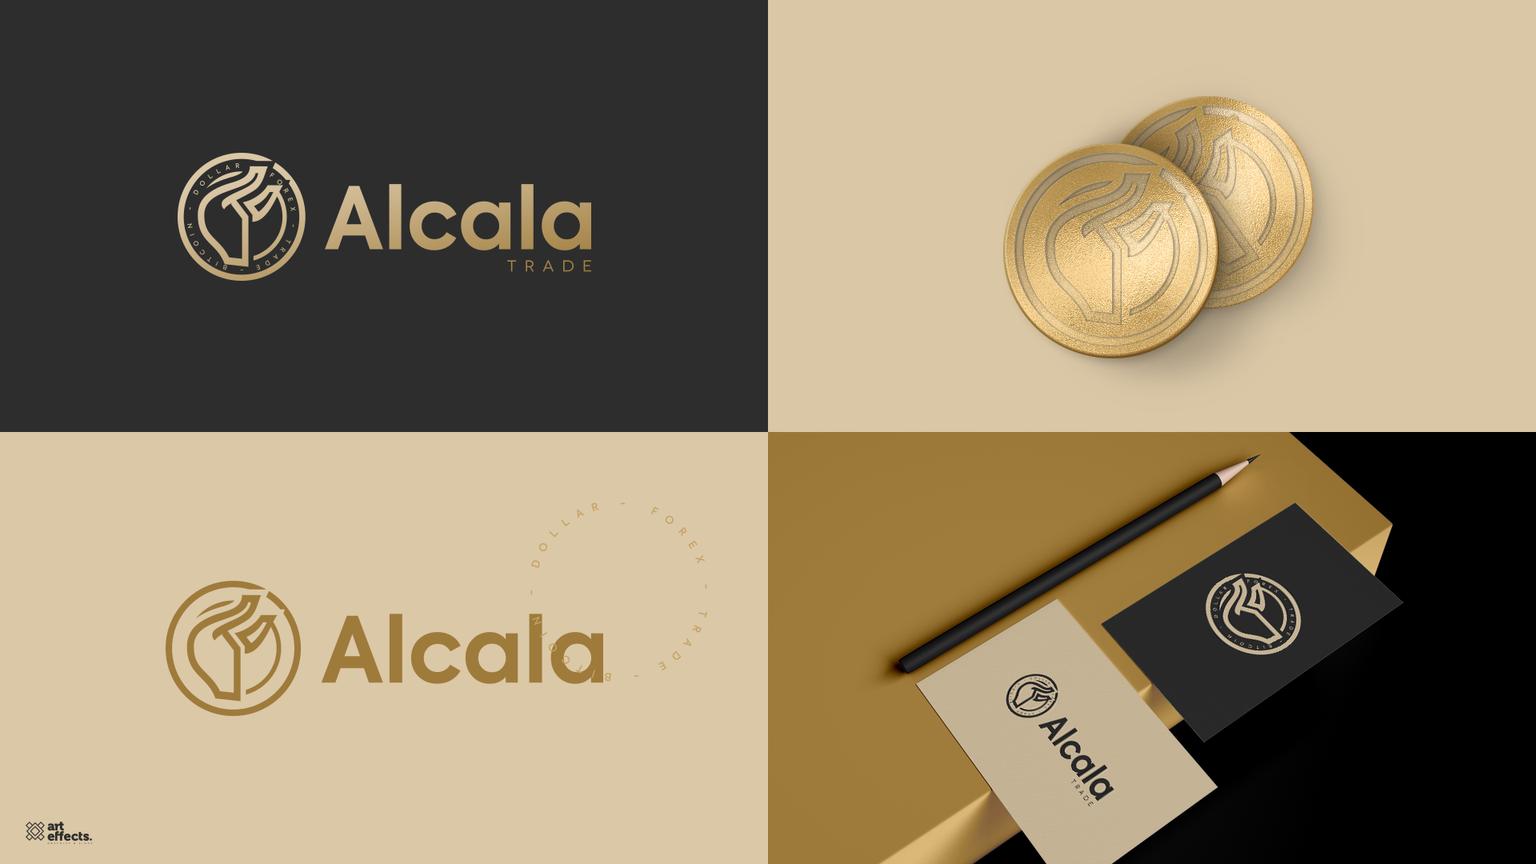 Alcala Trade